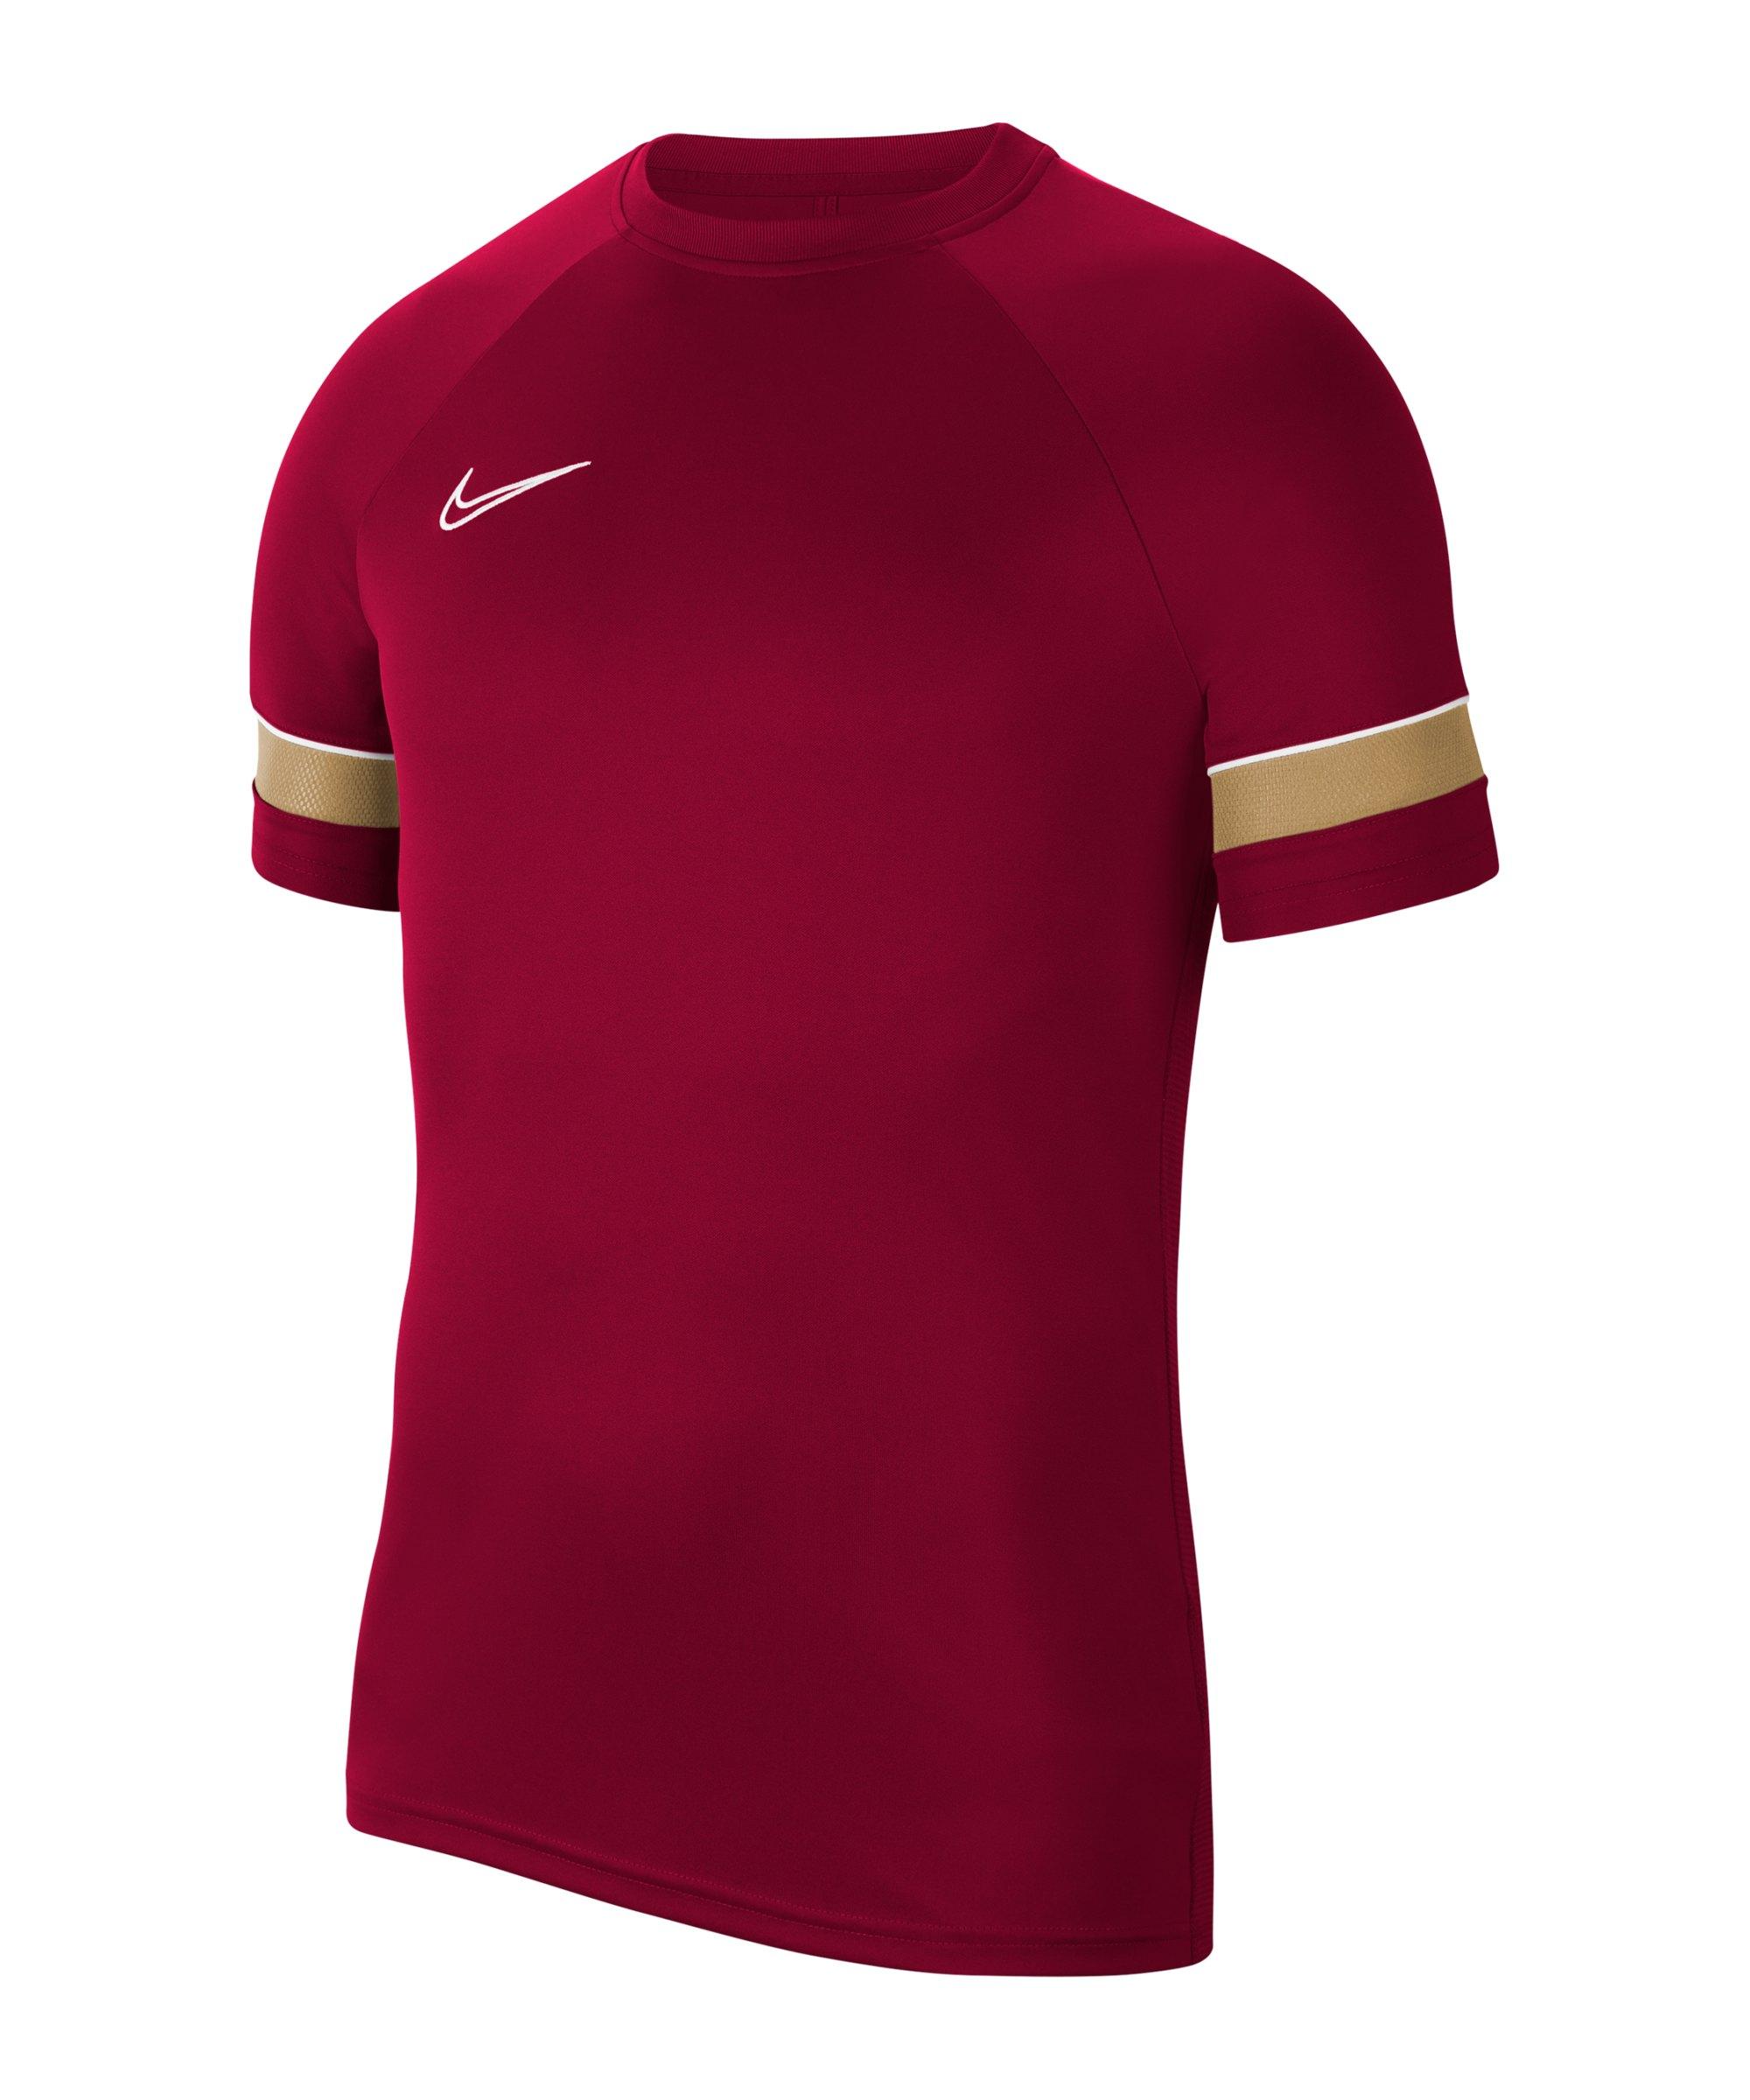 Nike Academy 21 T-Shirt Rot Weiss F677 - rot